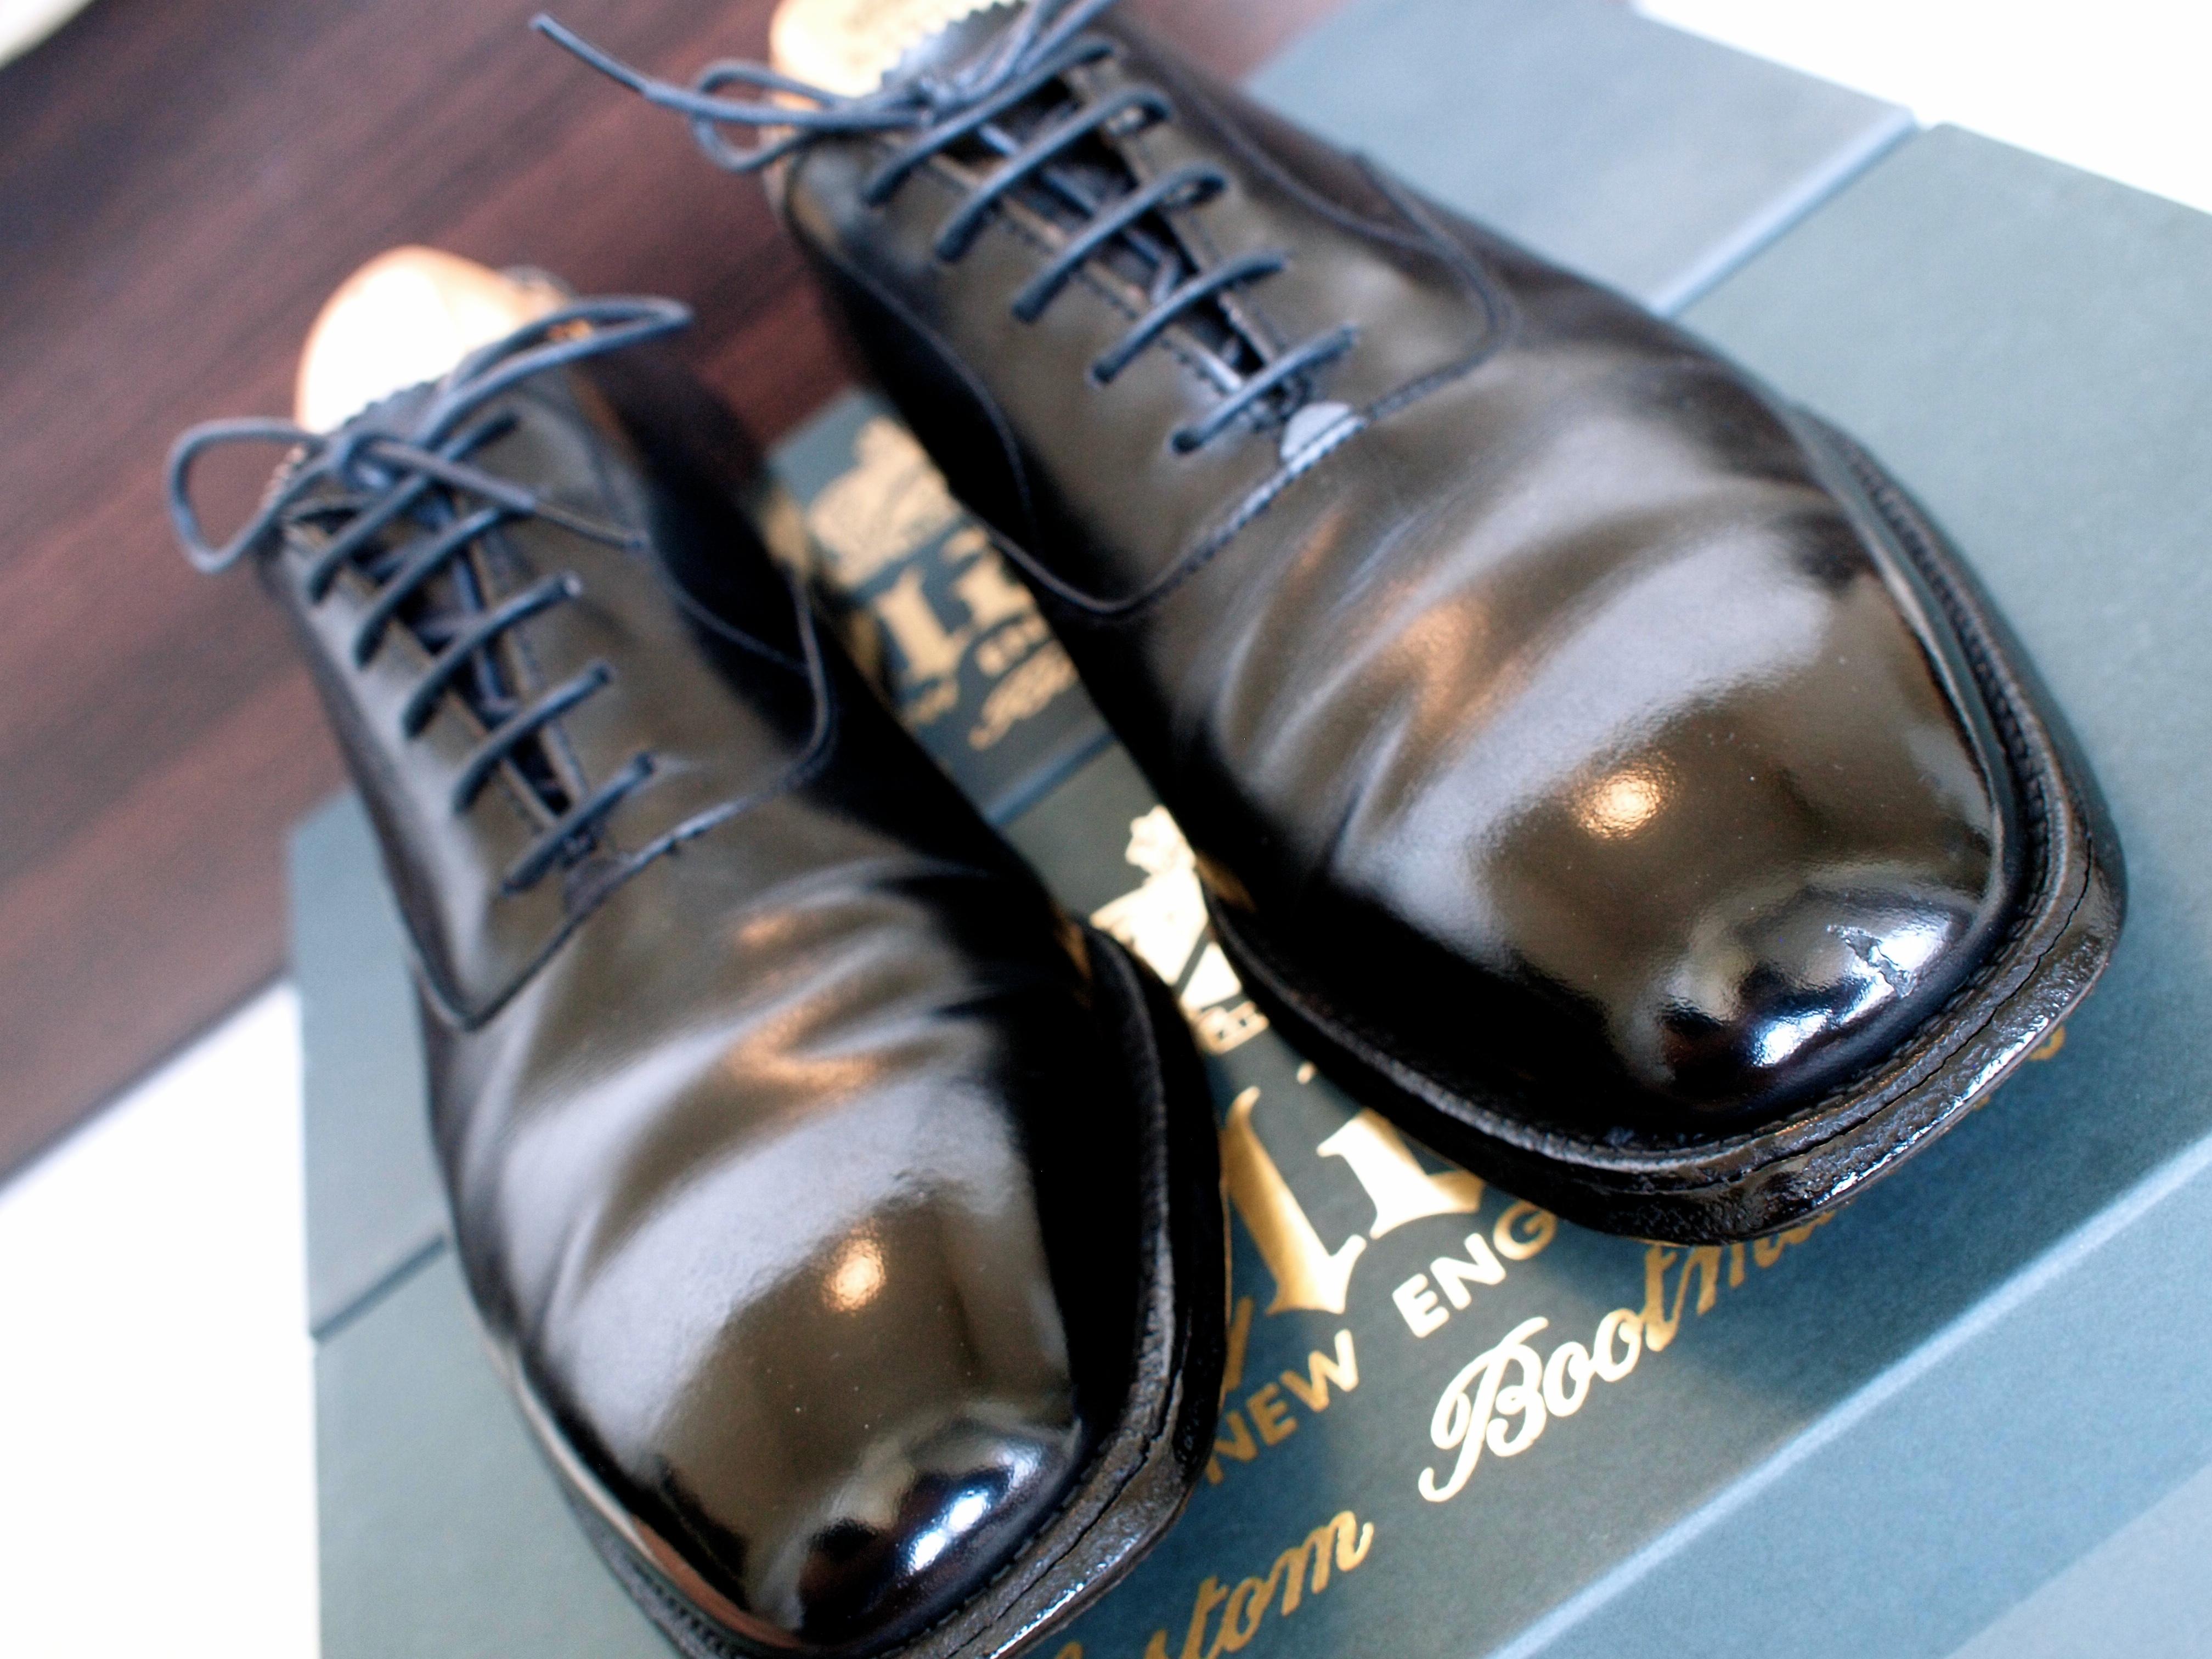 Alden Calf Plain Toe Barney's New York 10th Anniversary Model